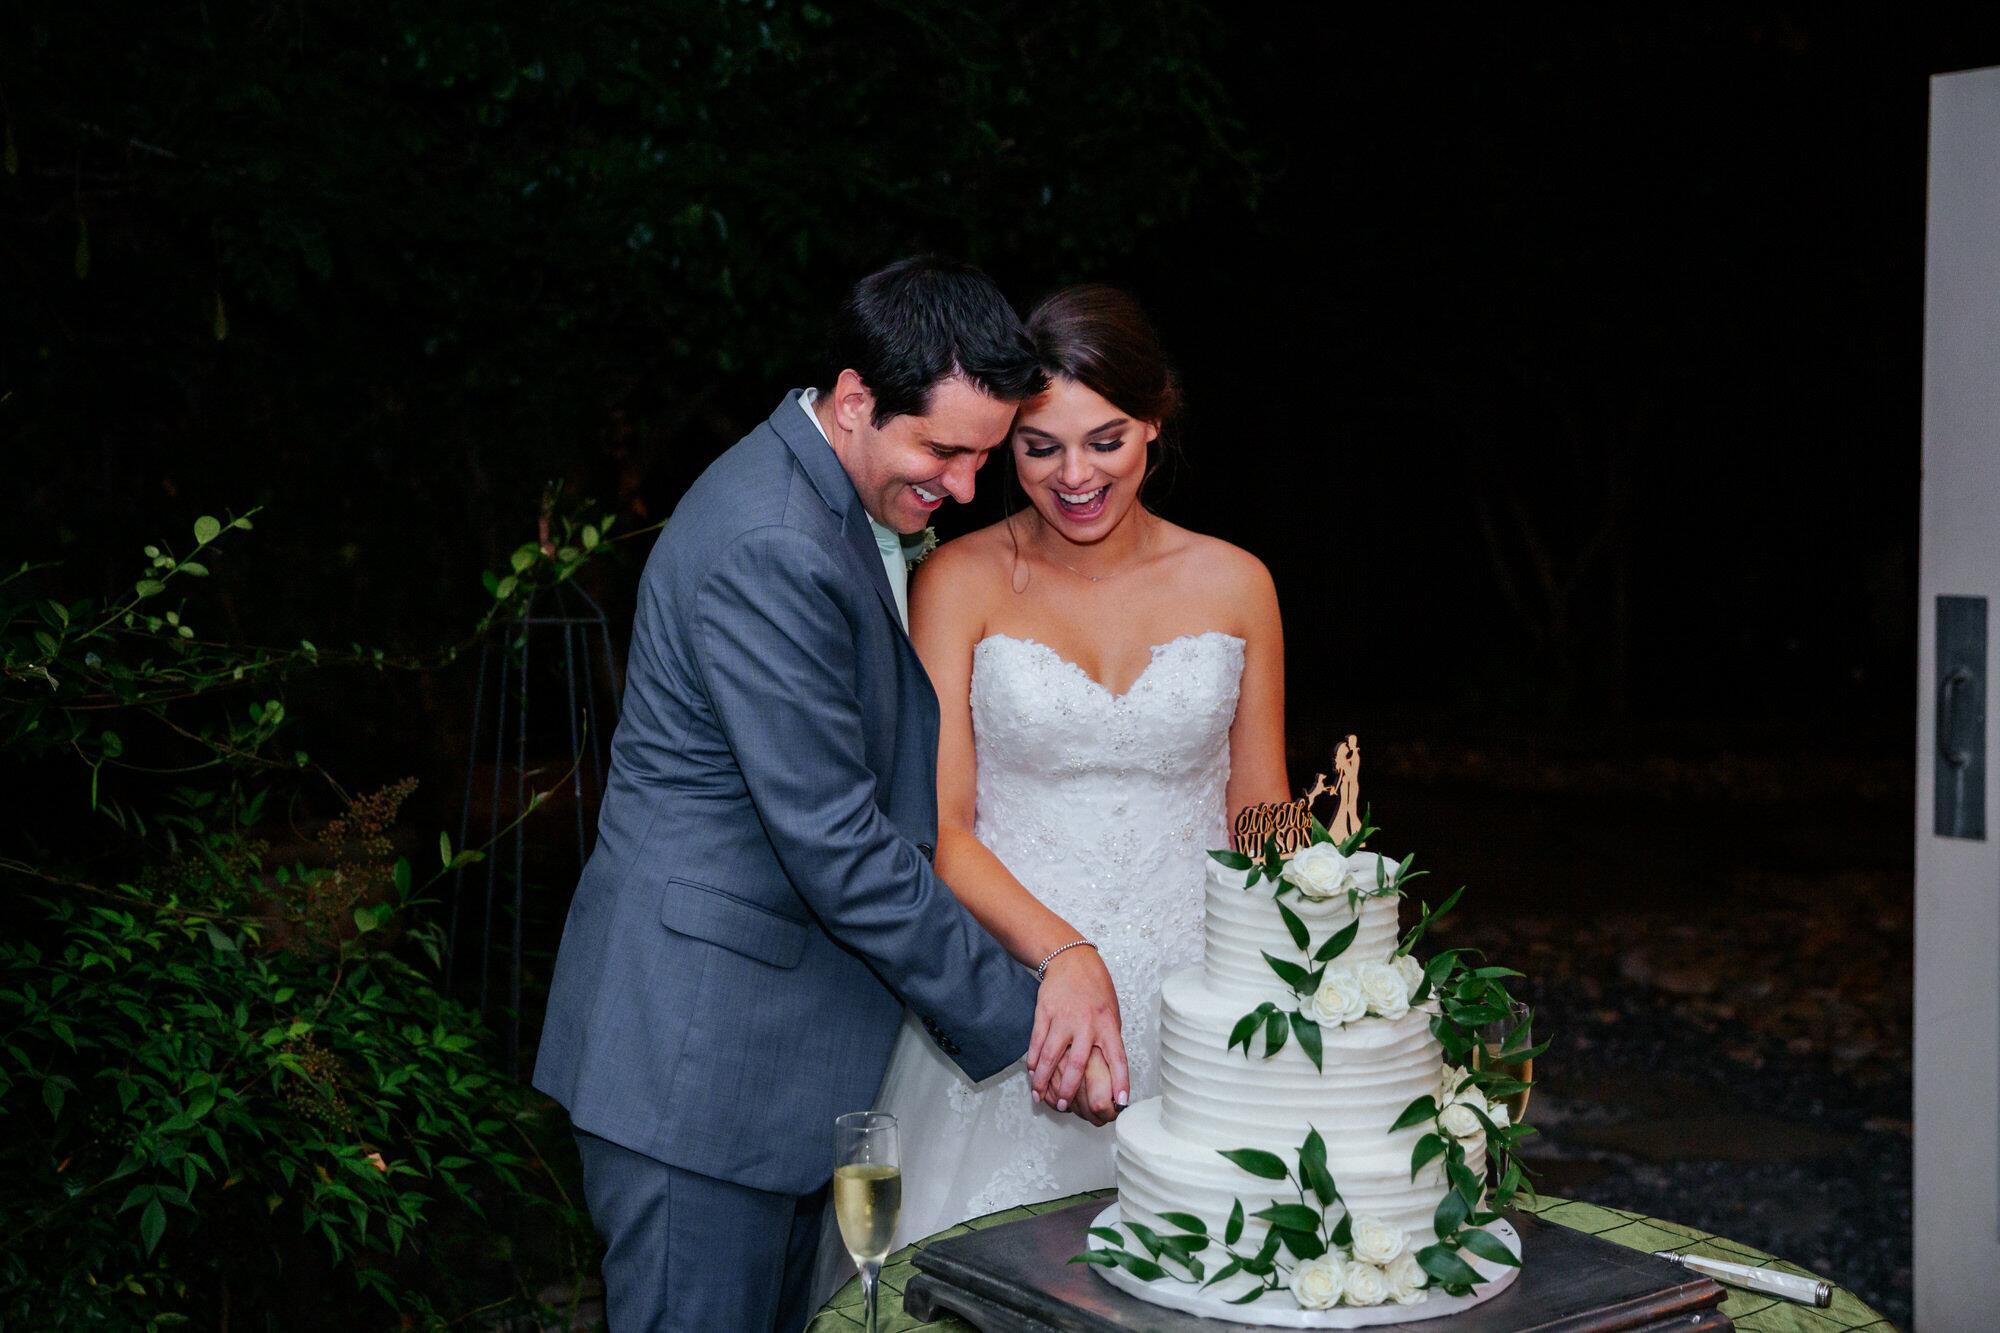 twigs-tempietto-wedding-greenville-downtown-389.JPG